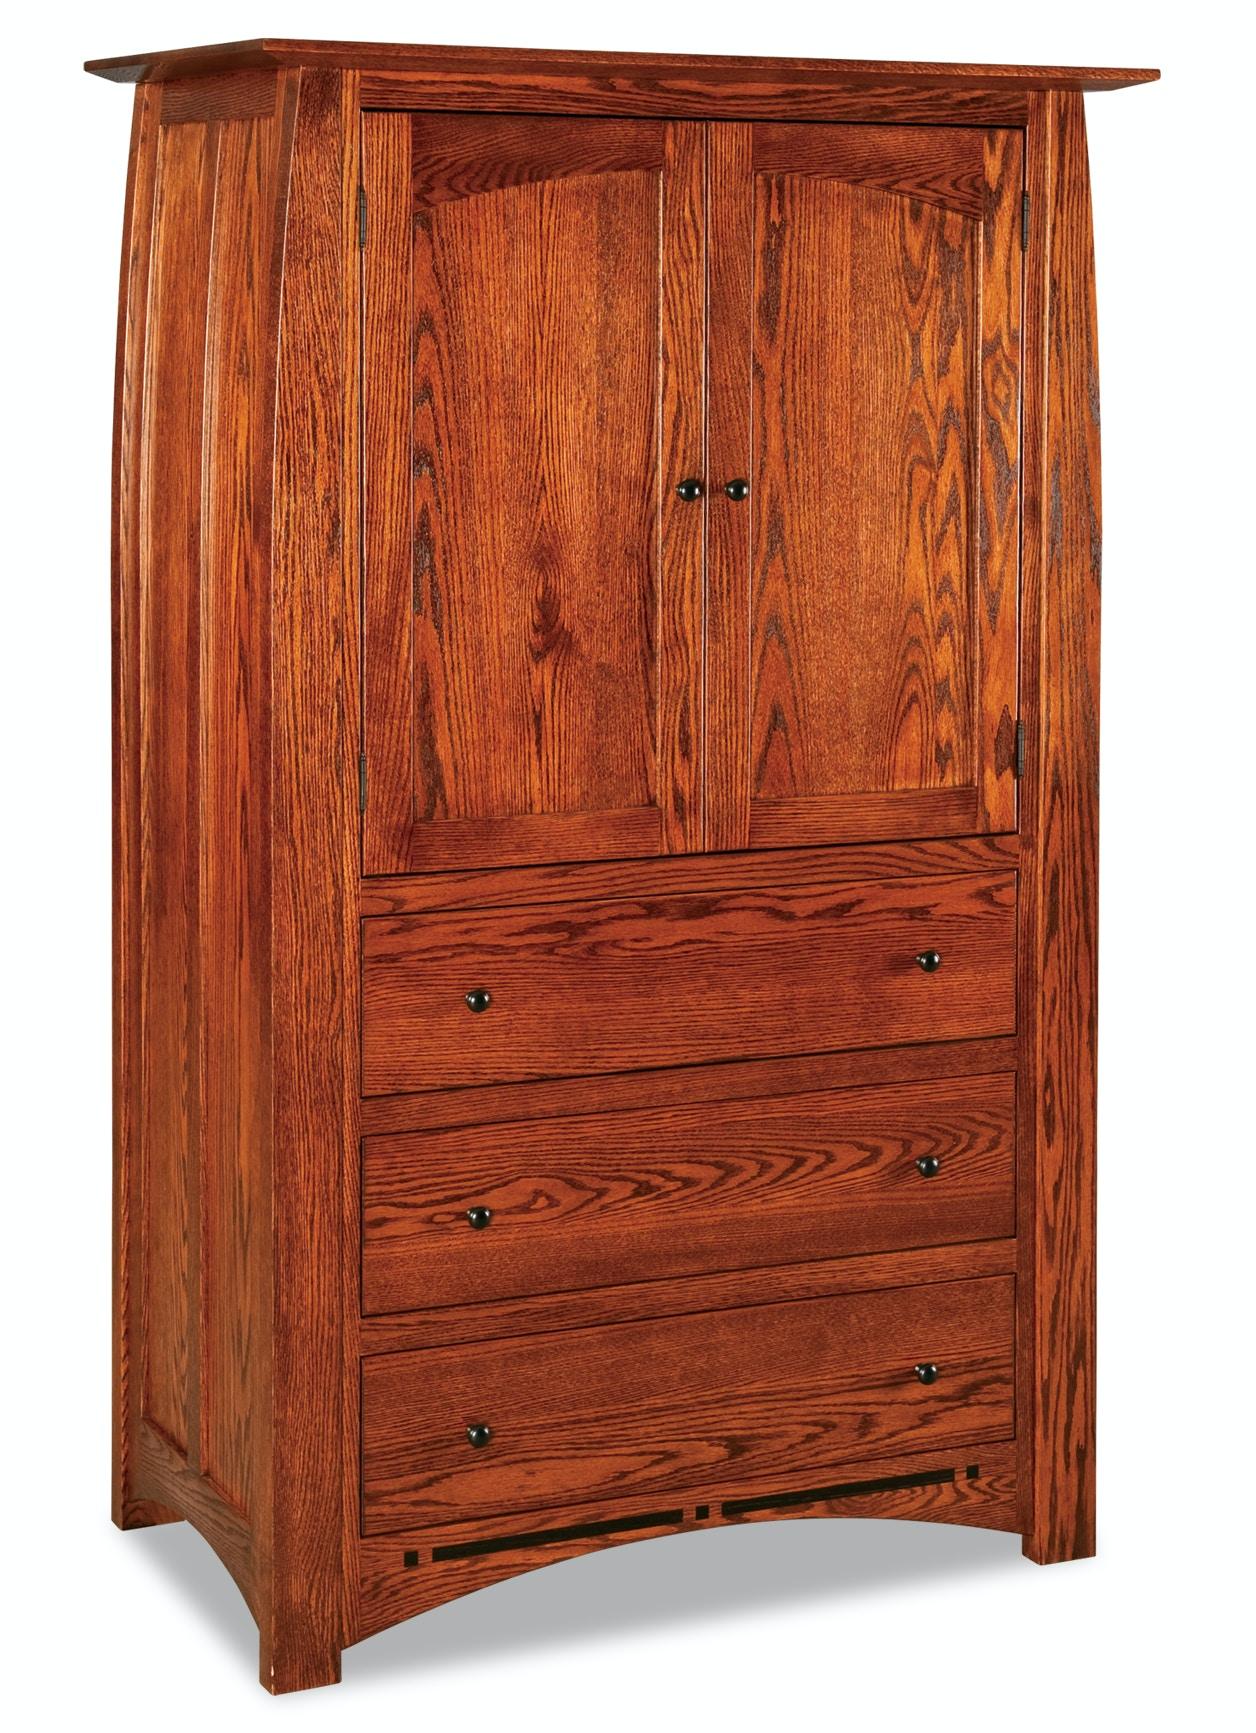 Ju0026R Woodworking Boulder Creek 3 Drawer 2 Door Armoire JRBC 041 3